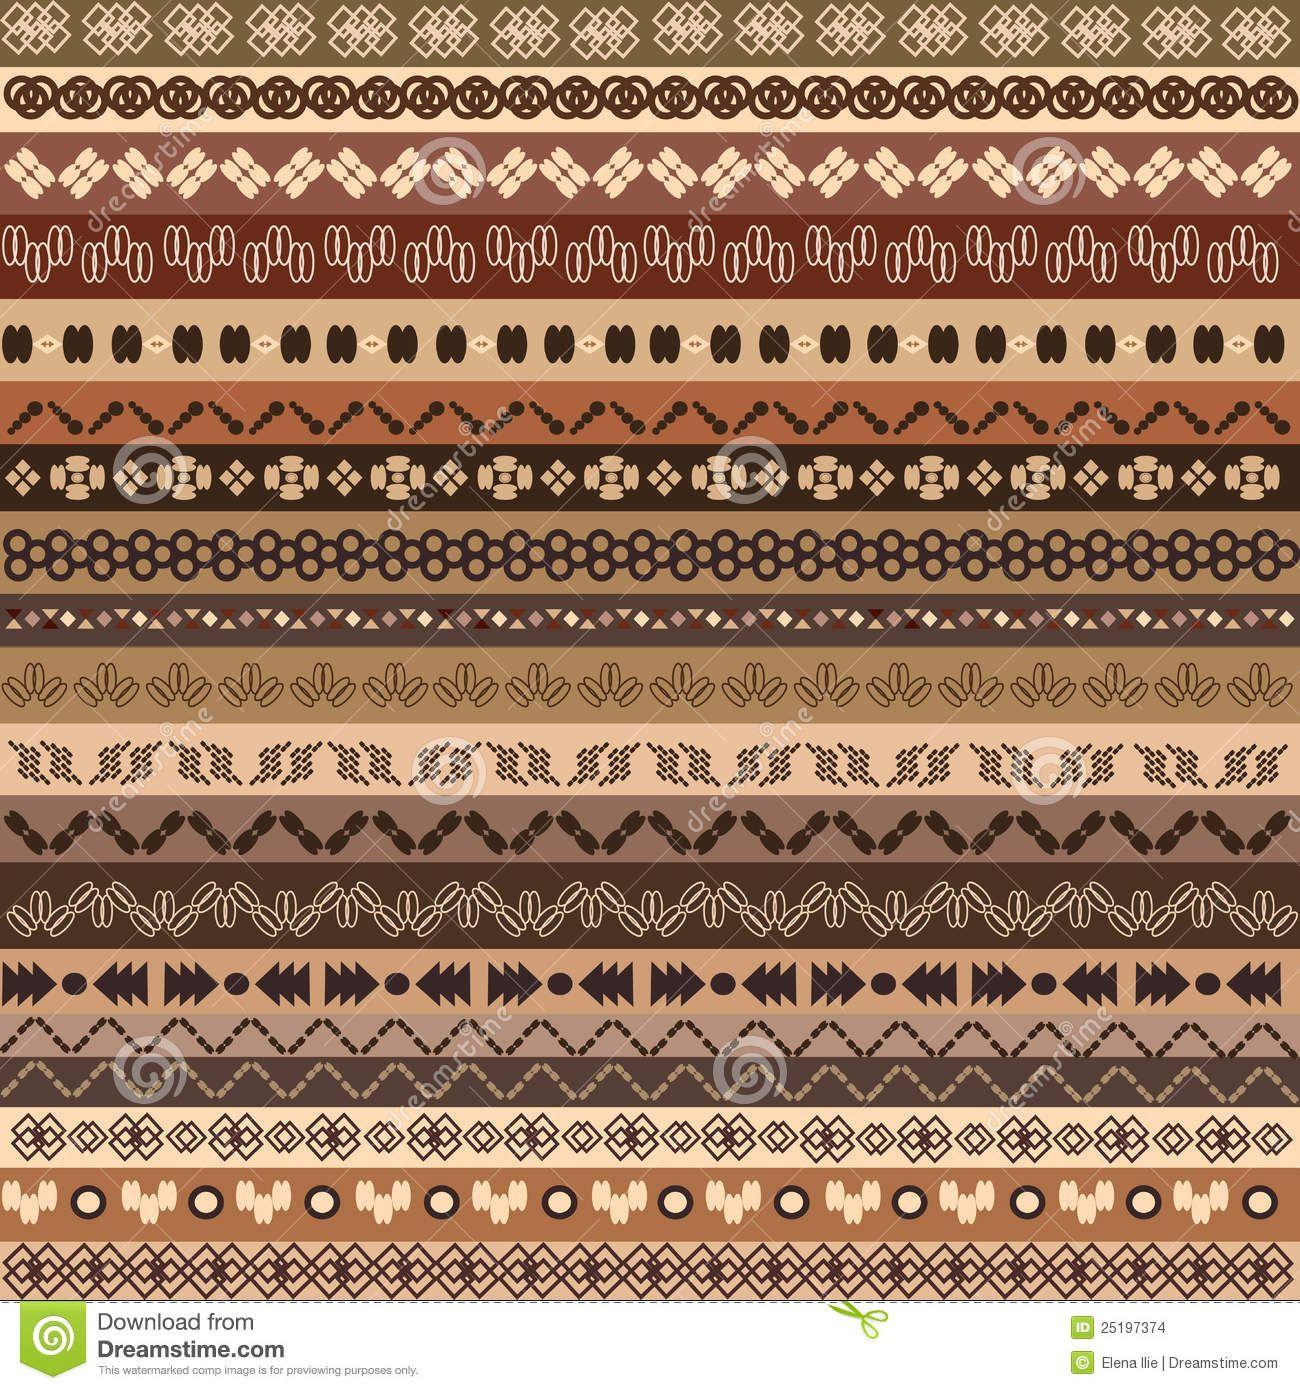 「Pattern ethnic」の画像検索結果